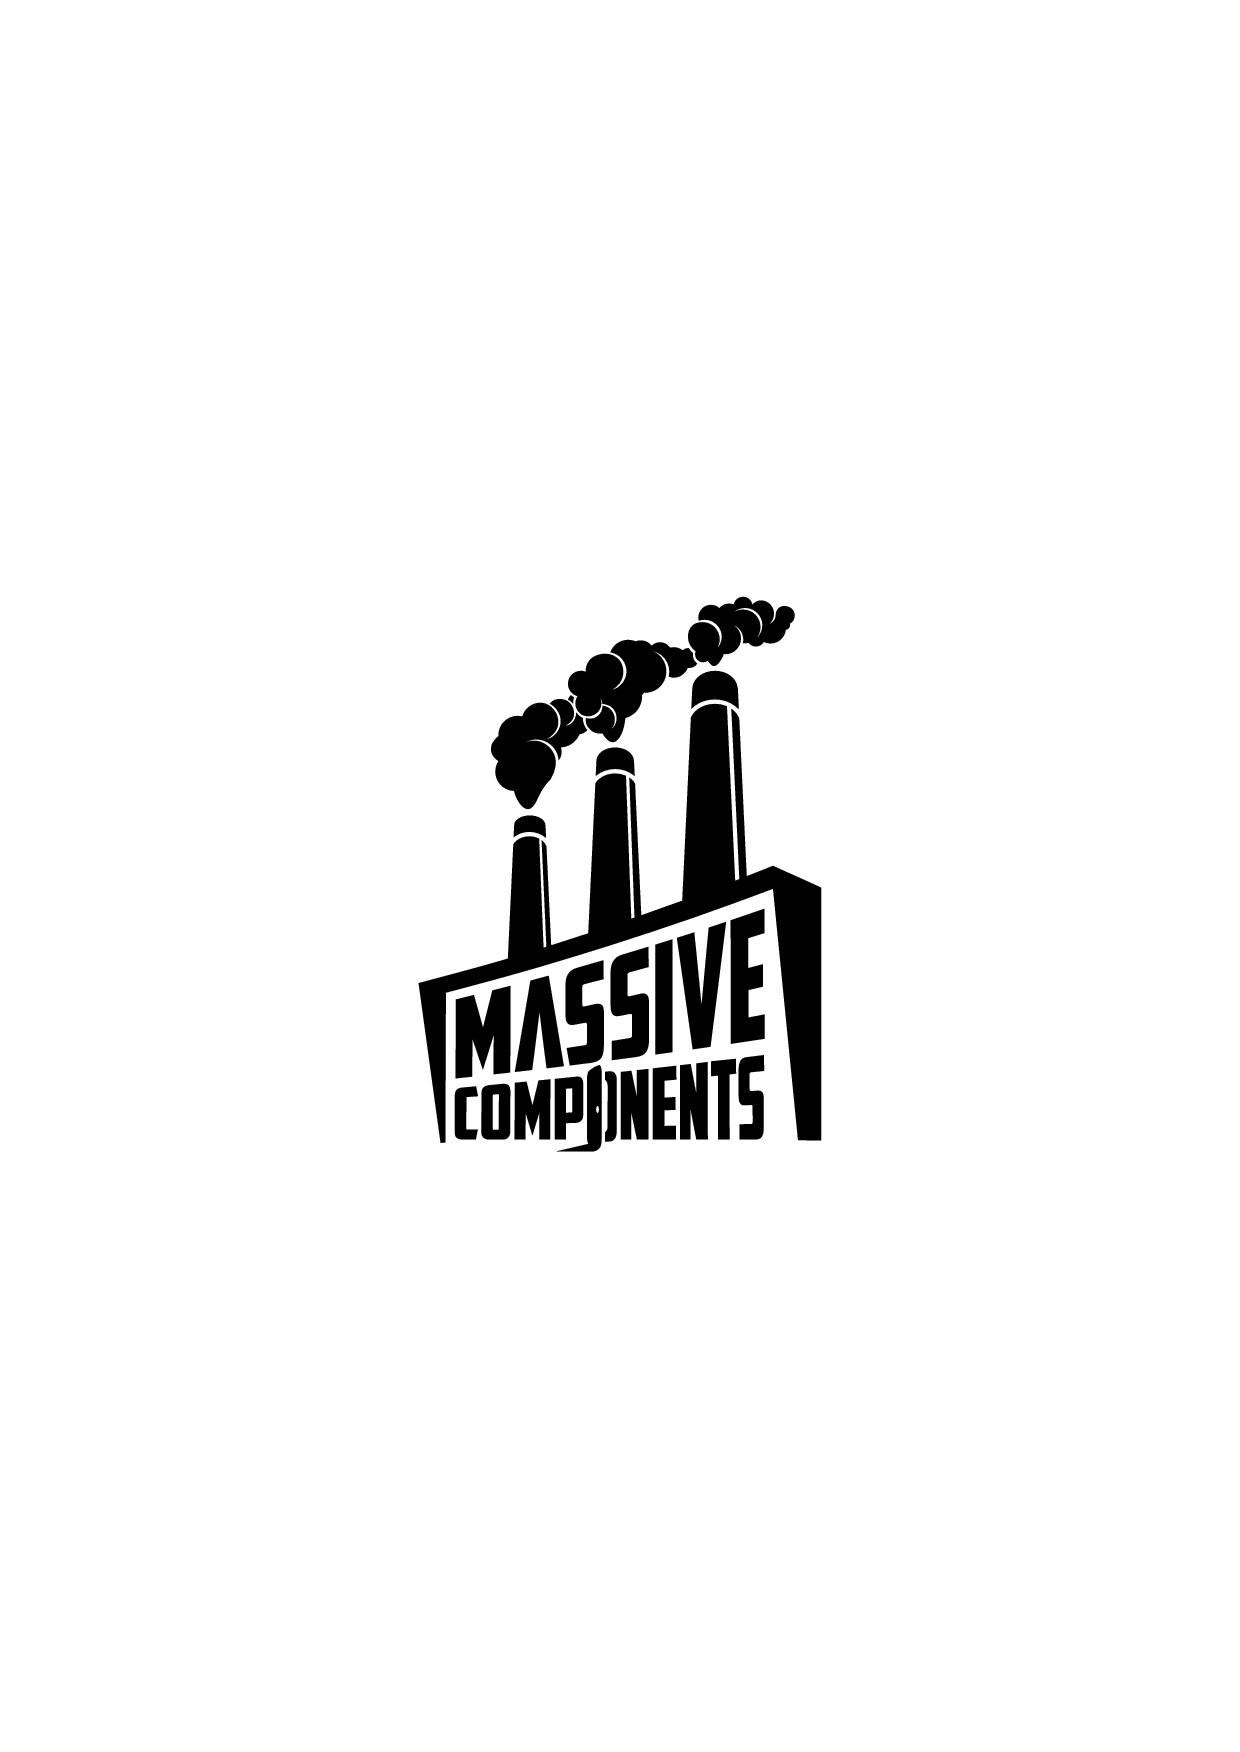 Massive Components (Kick Ass Logo Needed For Tough Ass Business!)